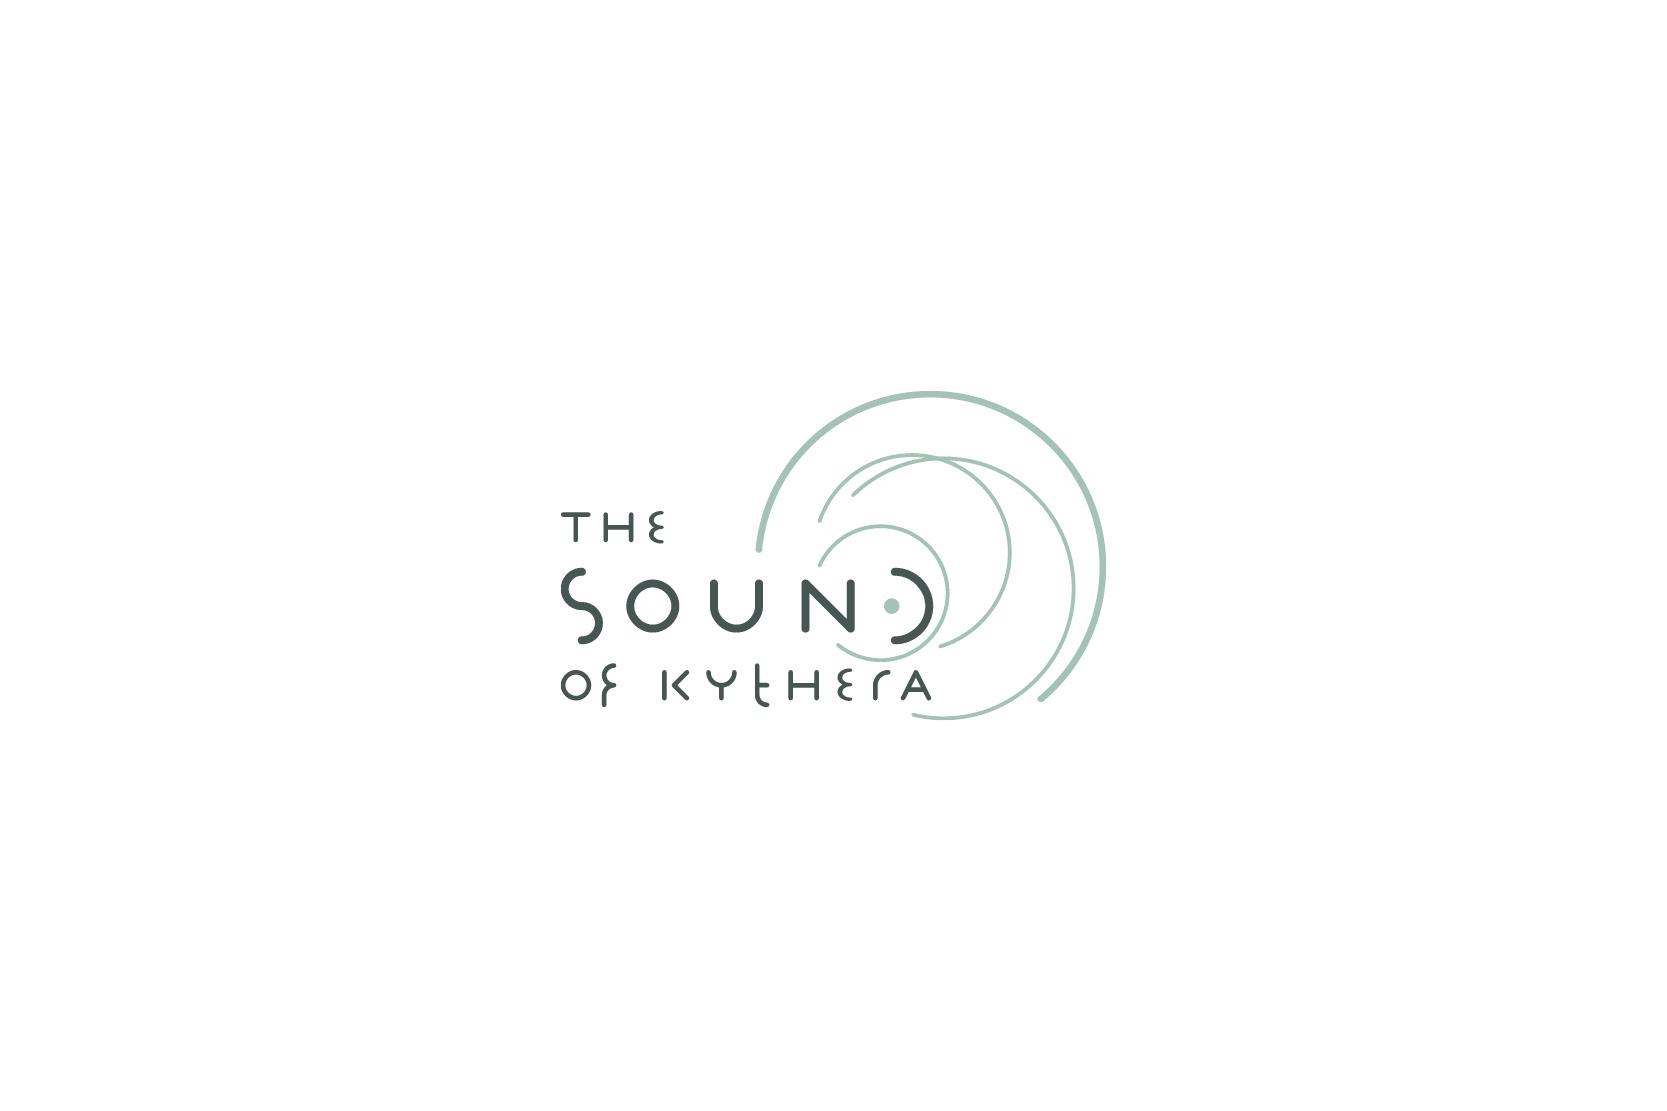 The sound of Kythera